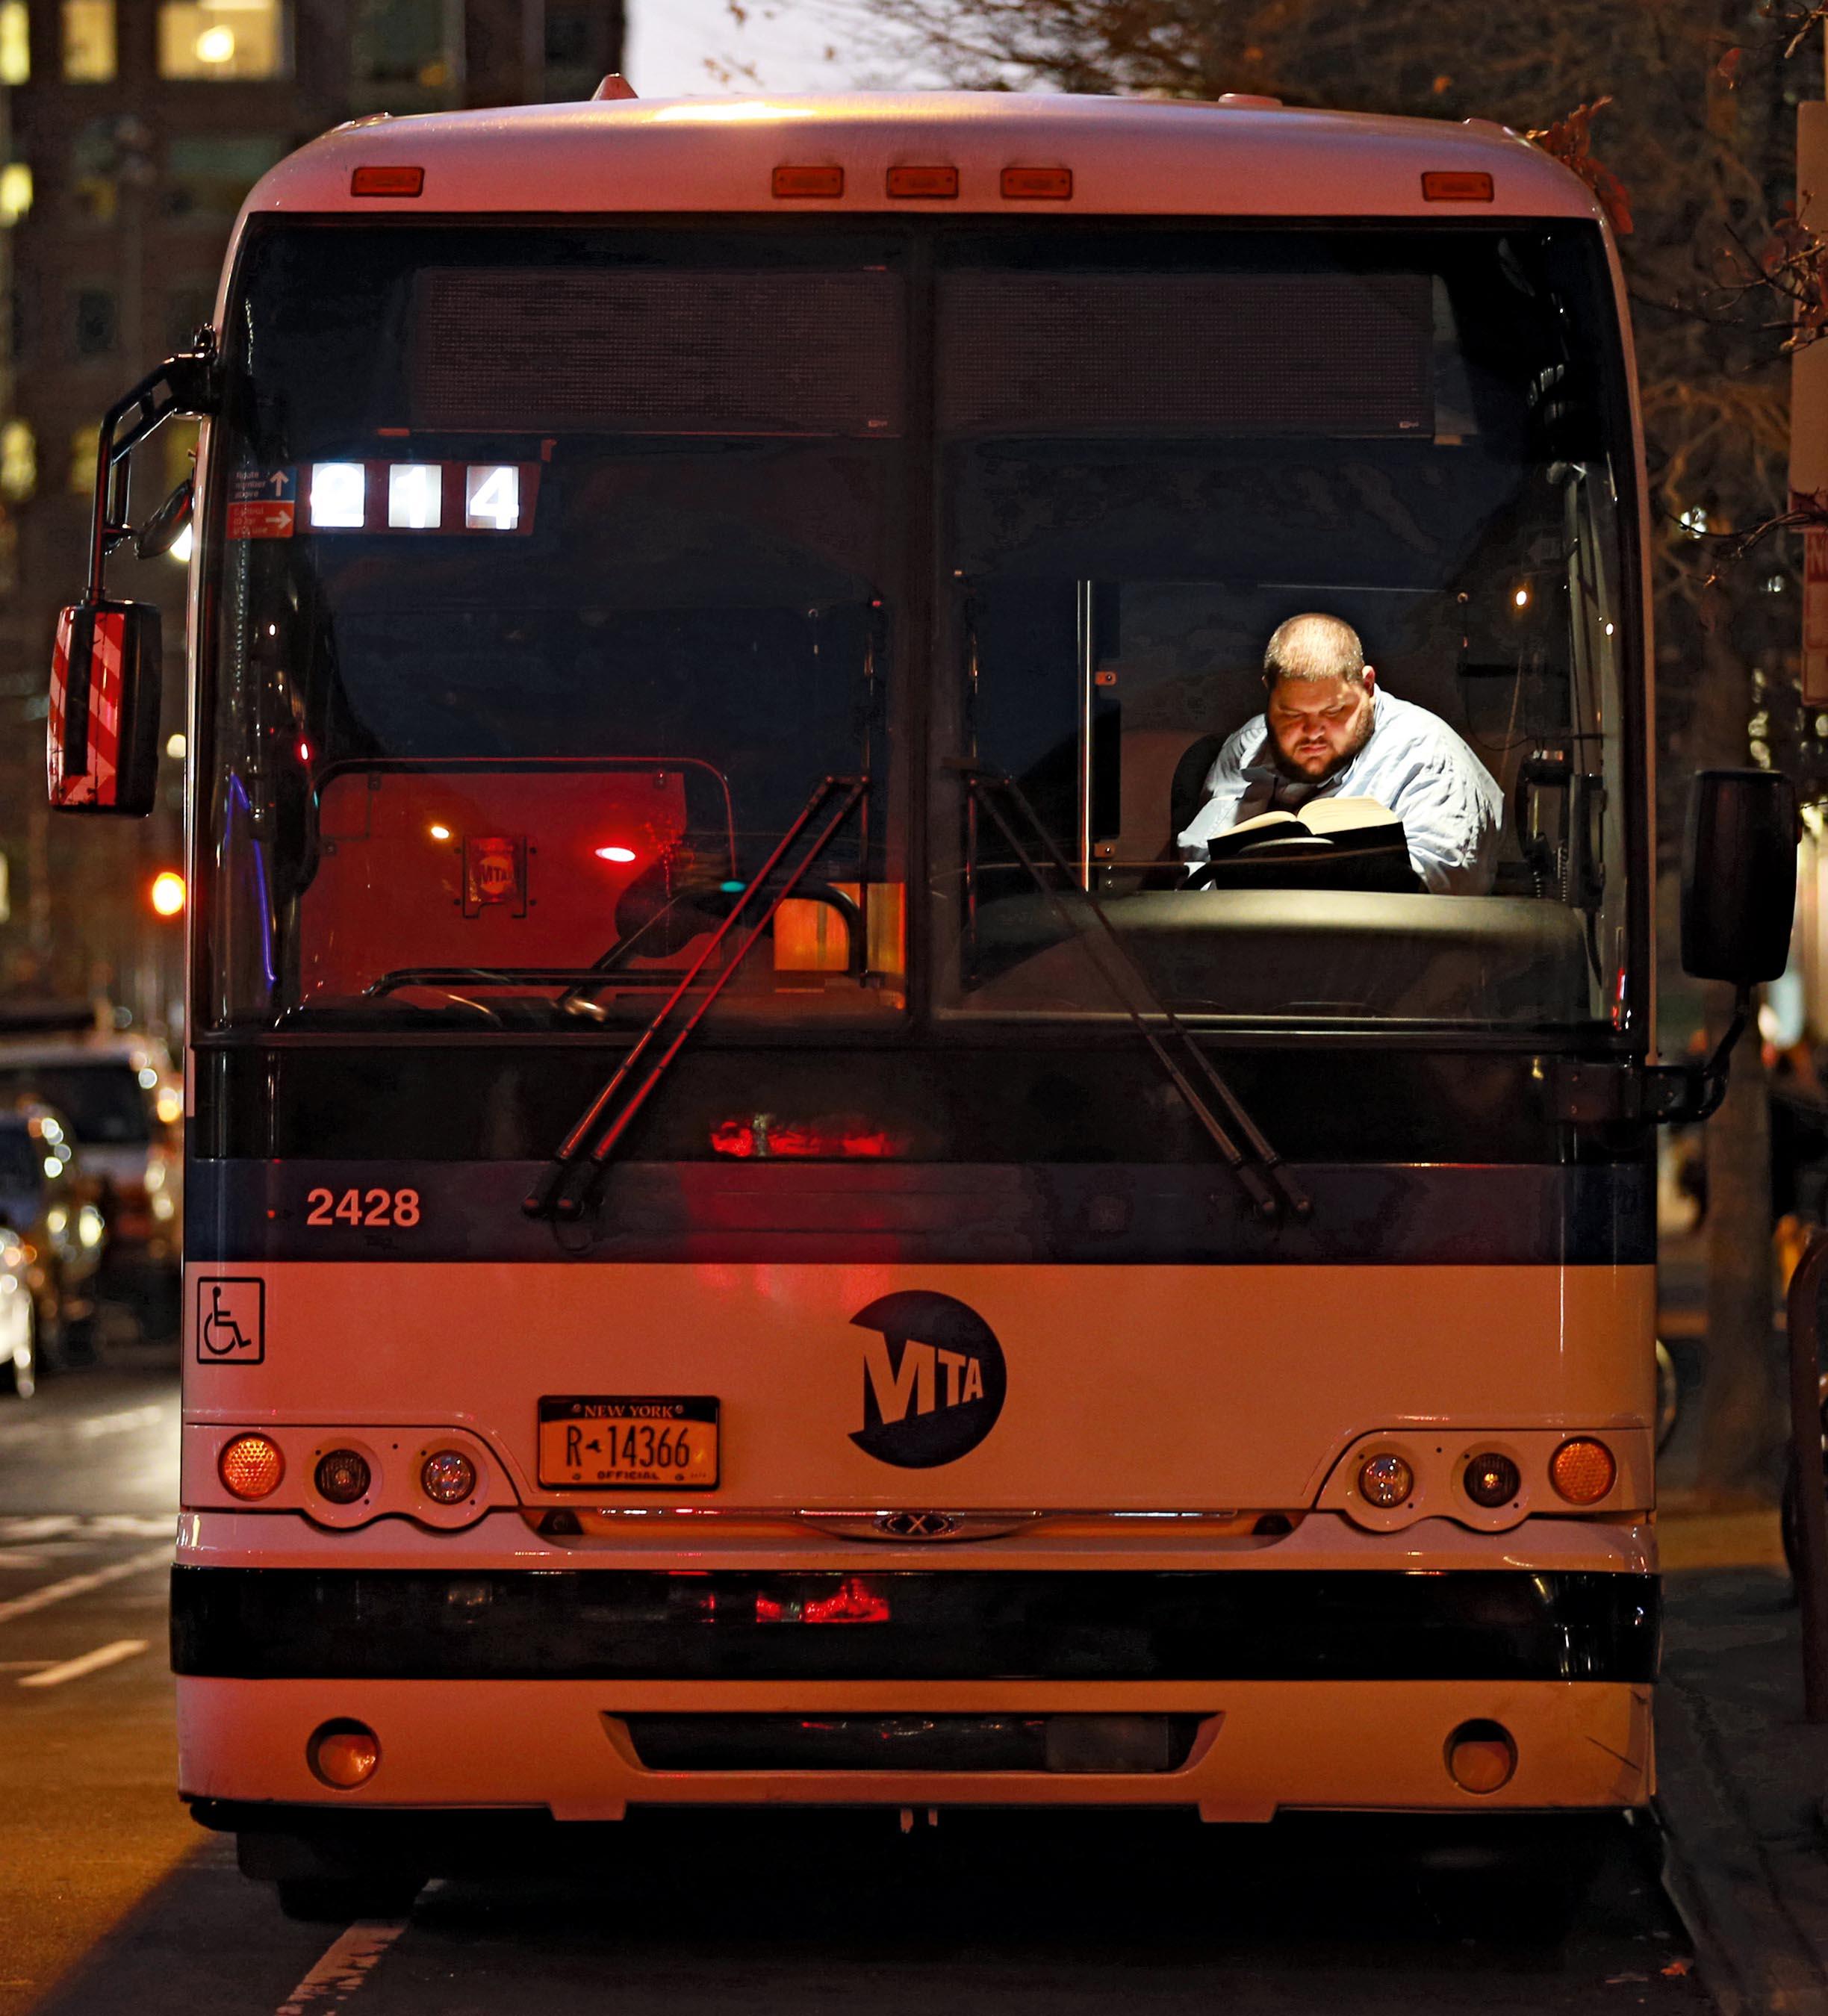 Bus Driver, Tribeca, NYC, 2013 © Lawrence Schwartzwald